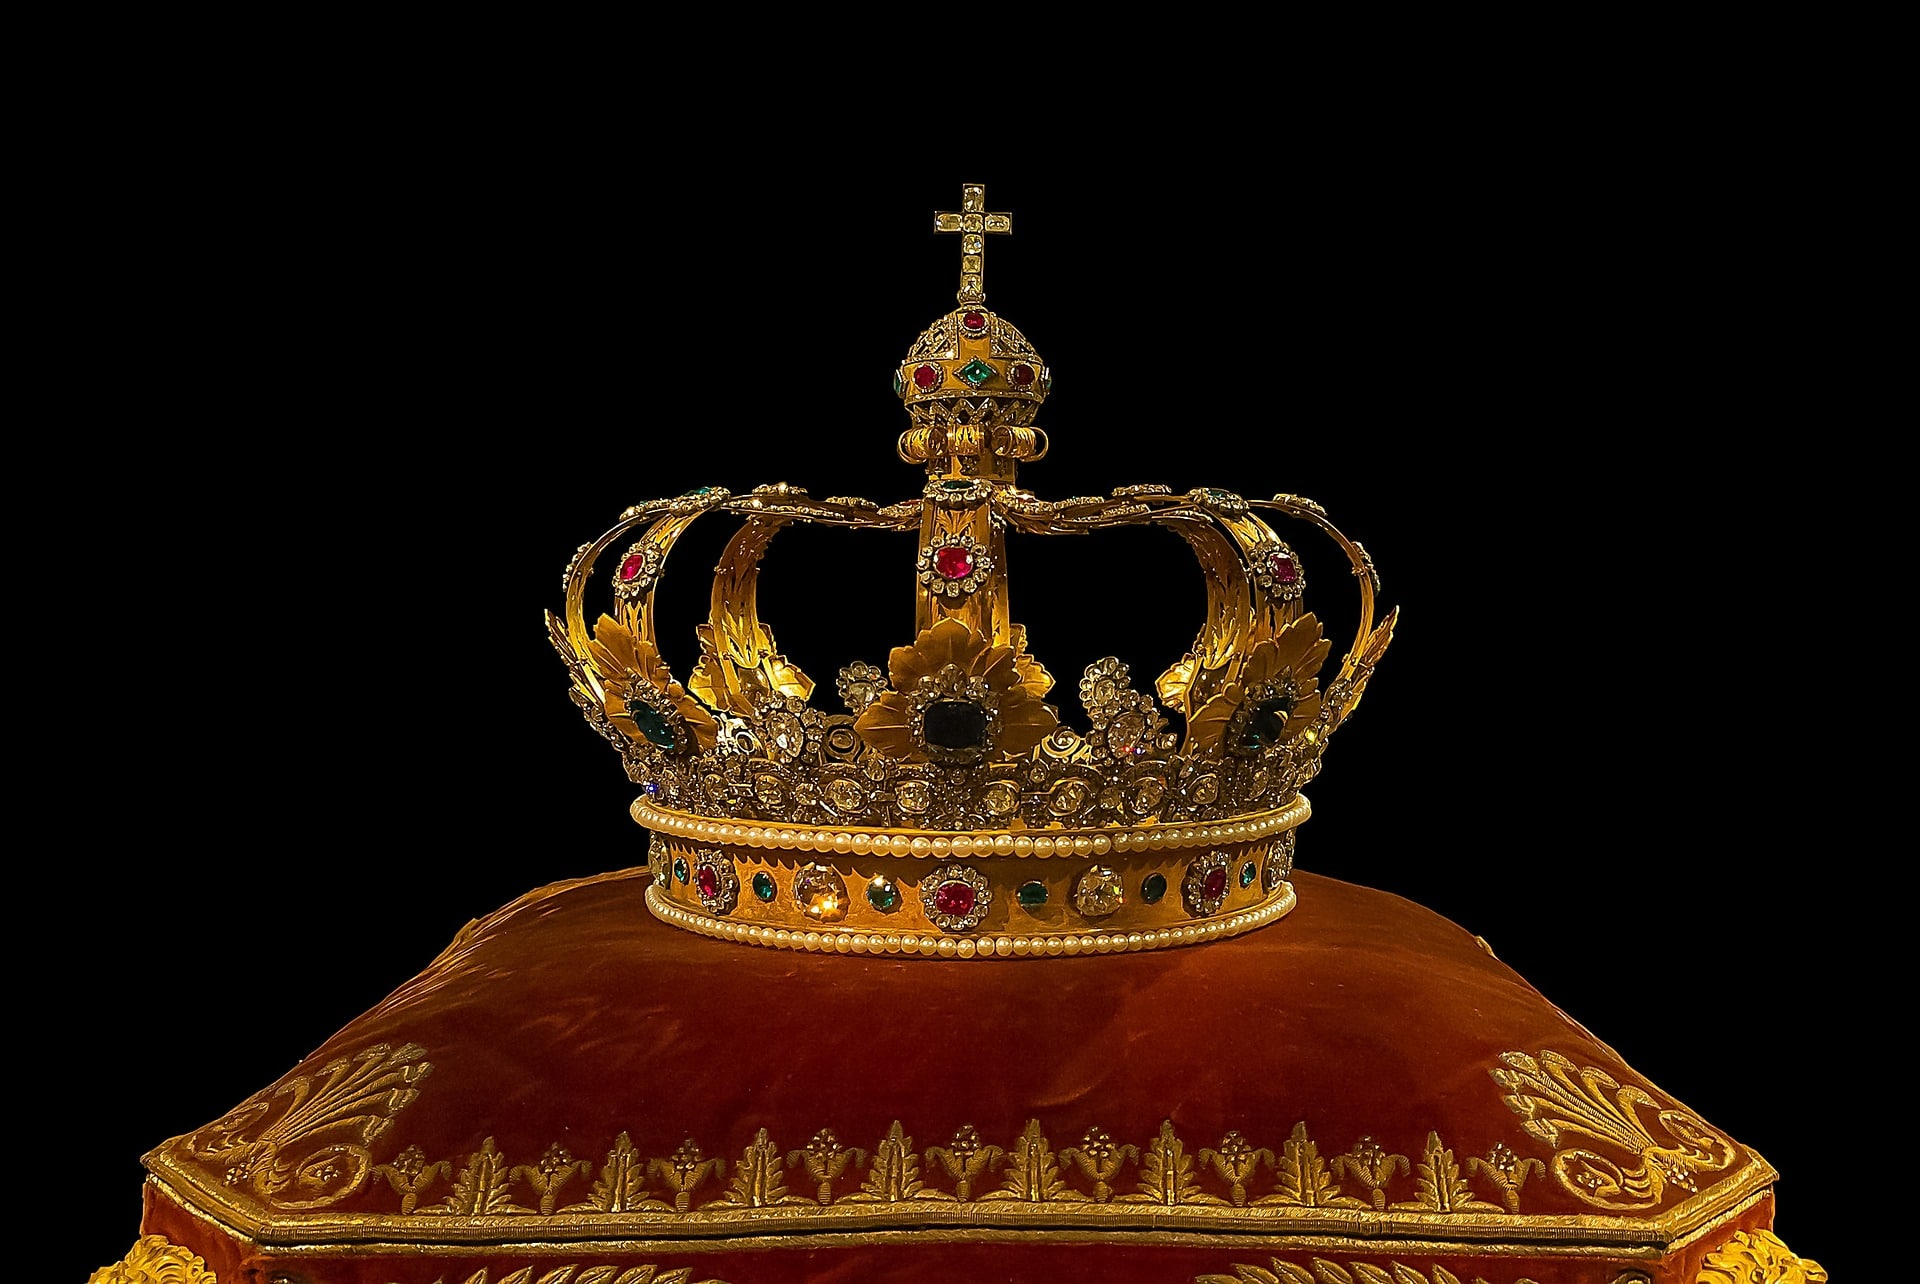 Corona de reyes